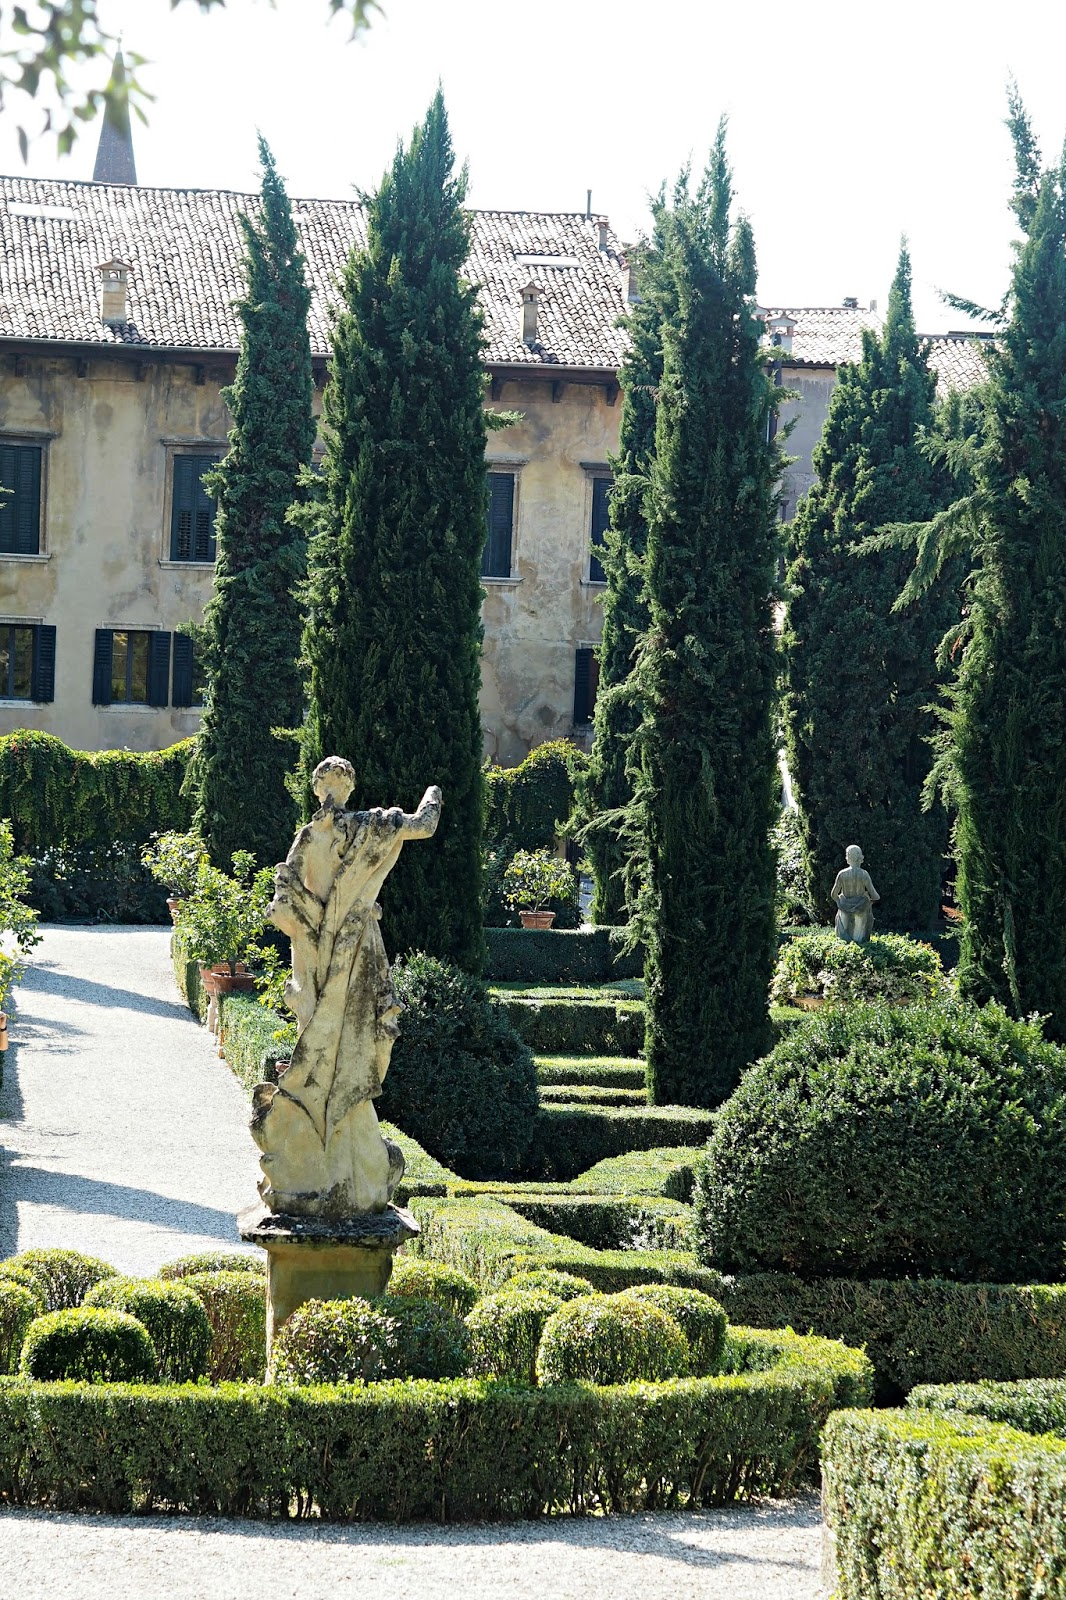 giardino giustin palatsi verona